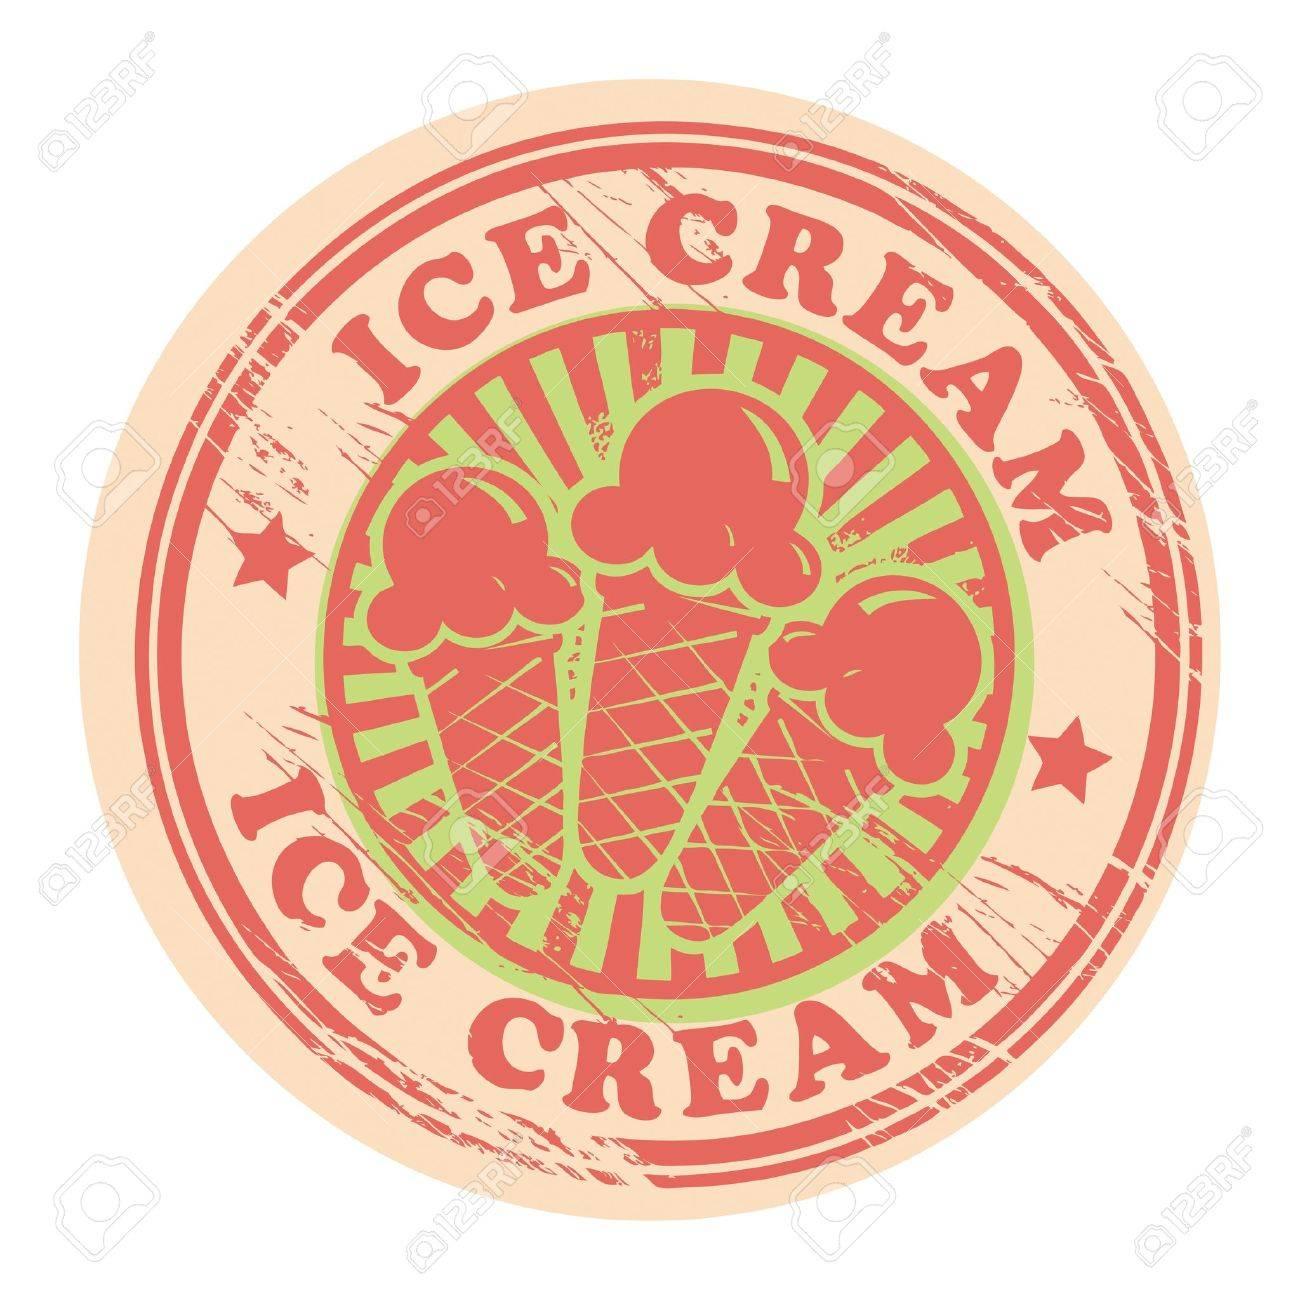 Vintage retro ice cream label Stock Vector - 15334793